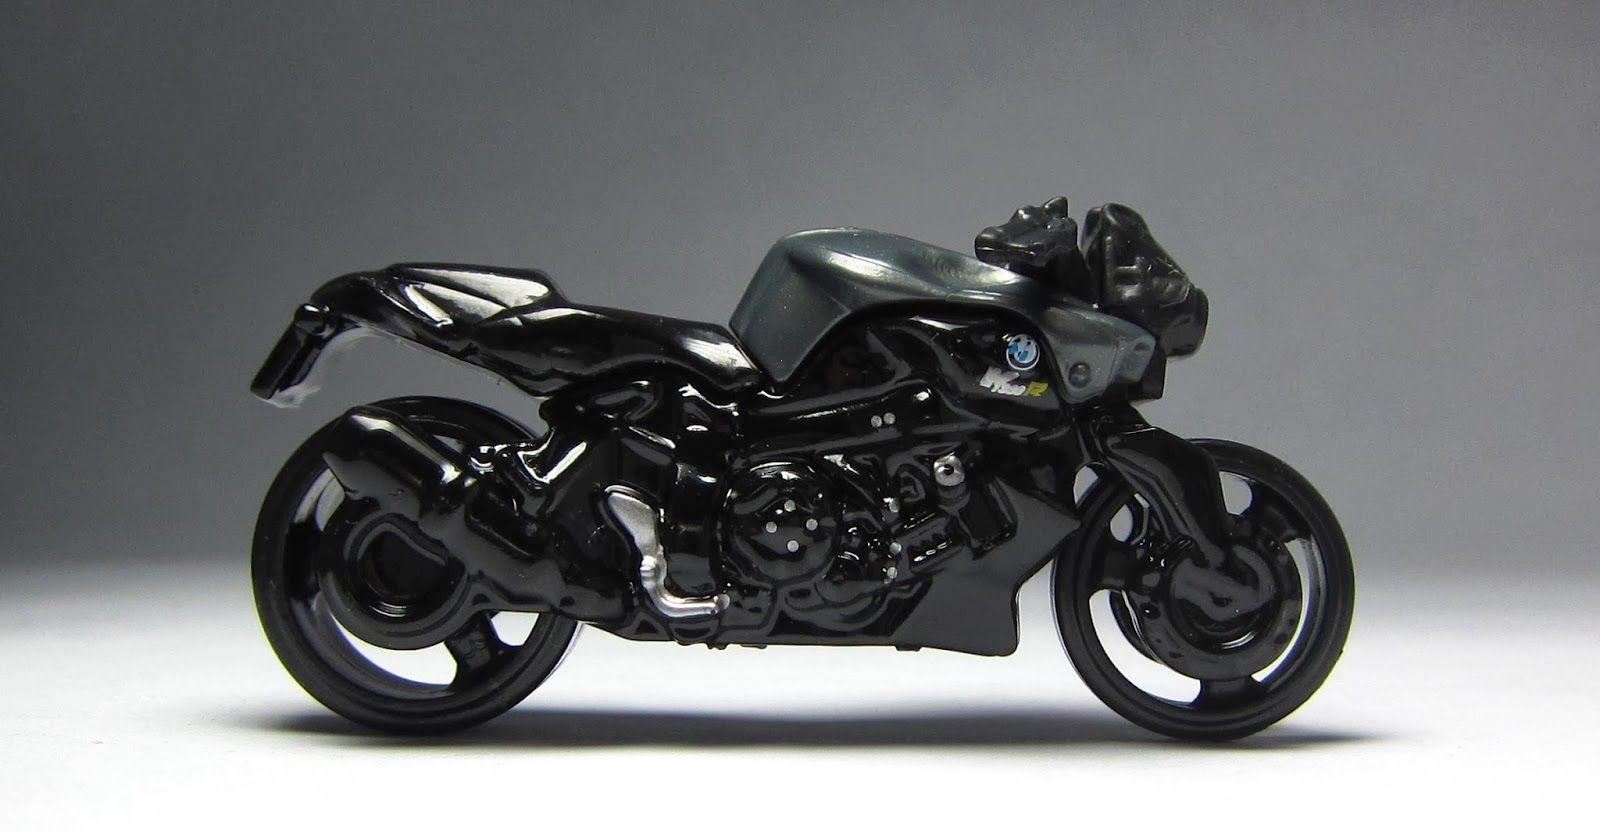 First Look 2014 Hot Wheels Bmw K1300 R Motorcycle Hot Wheels